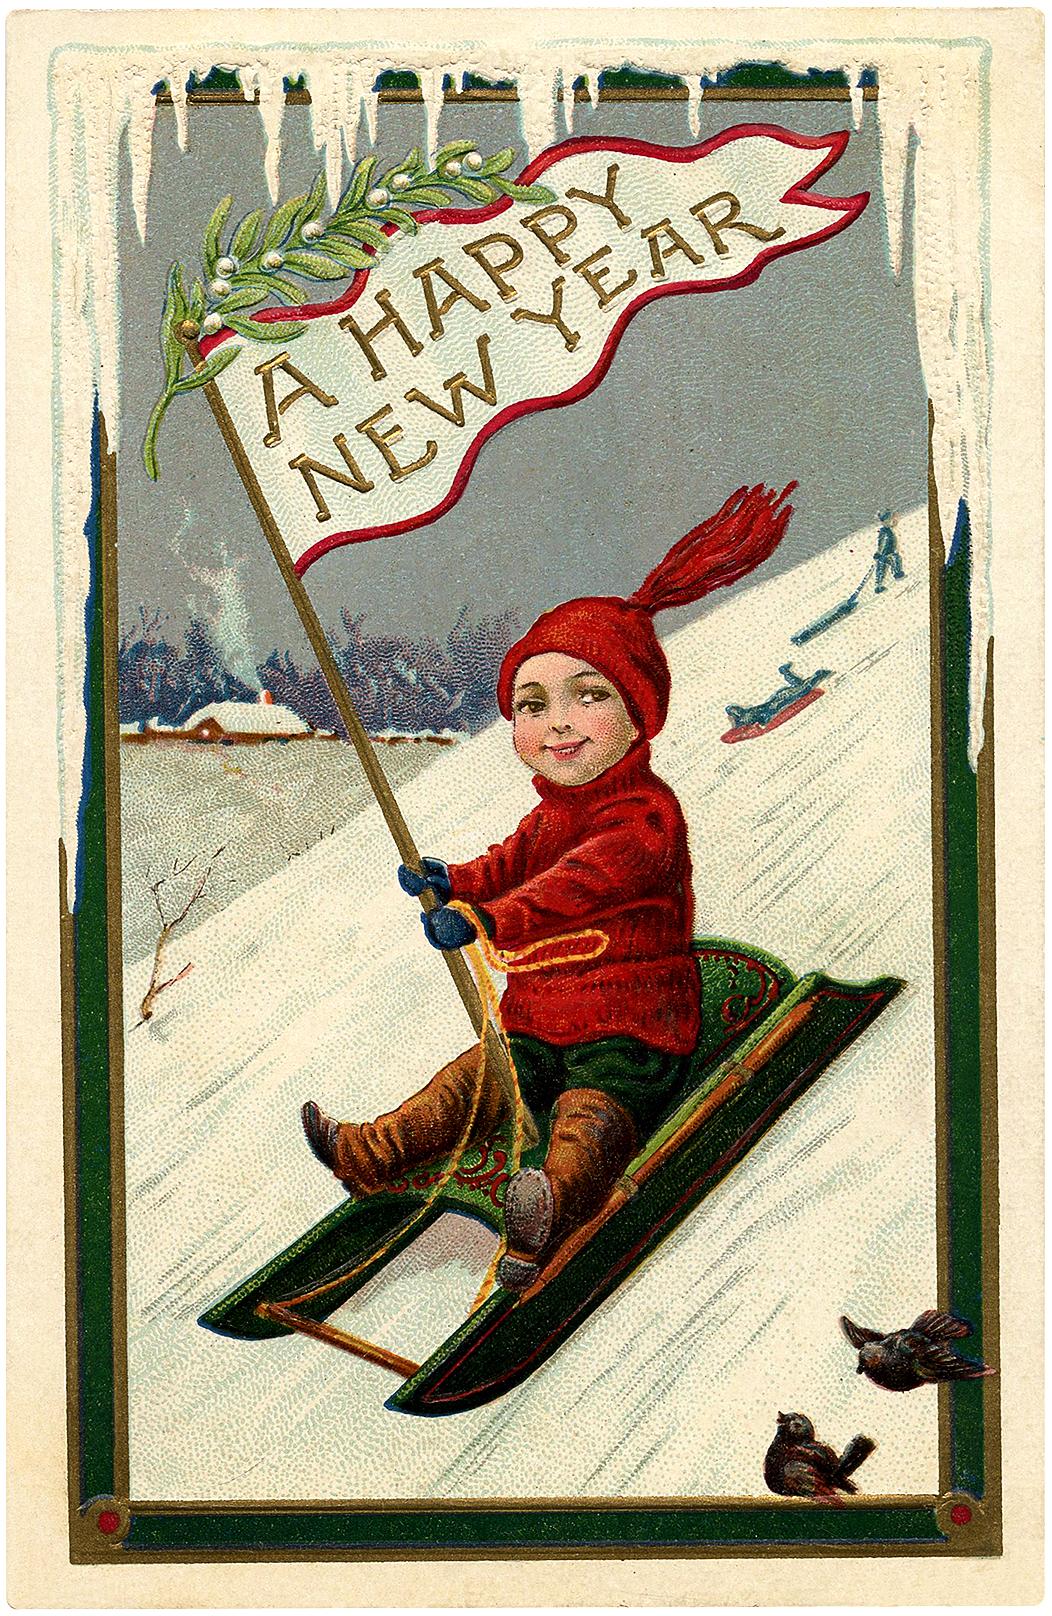 Cute Vintage New Year Sled Boy Image